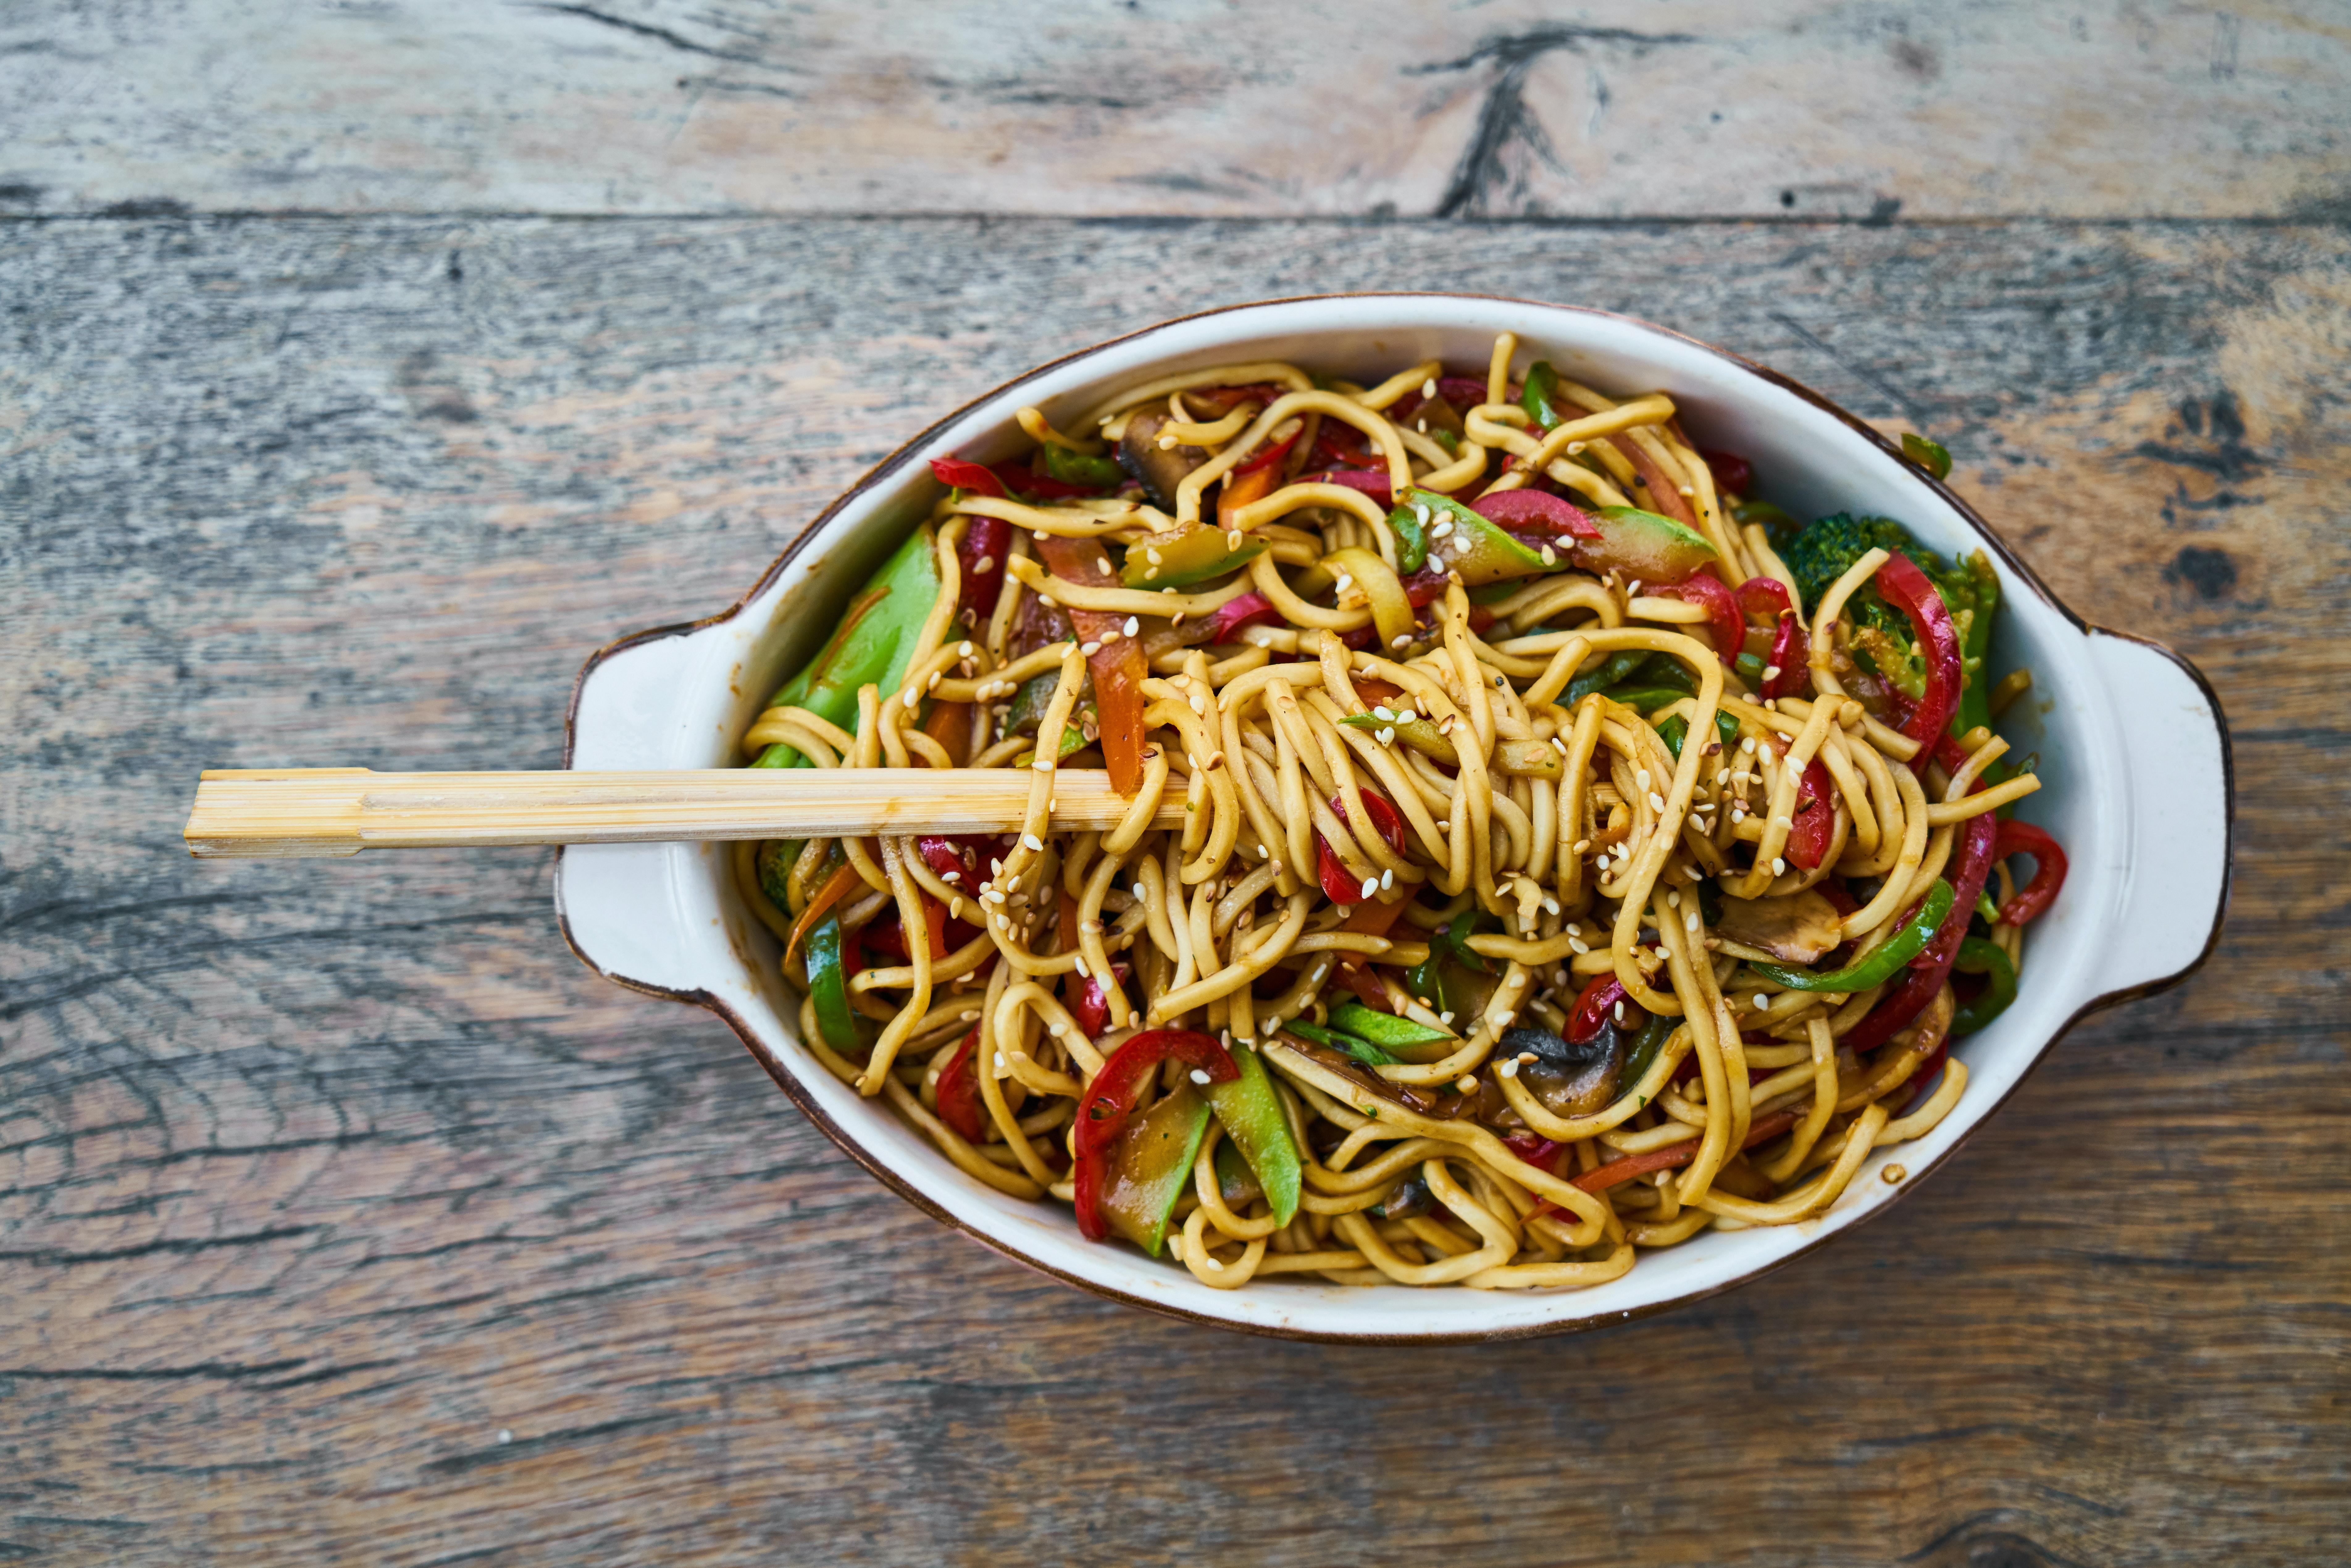 stir-fry-noodles